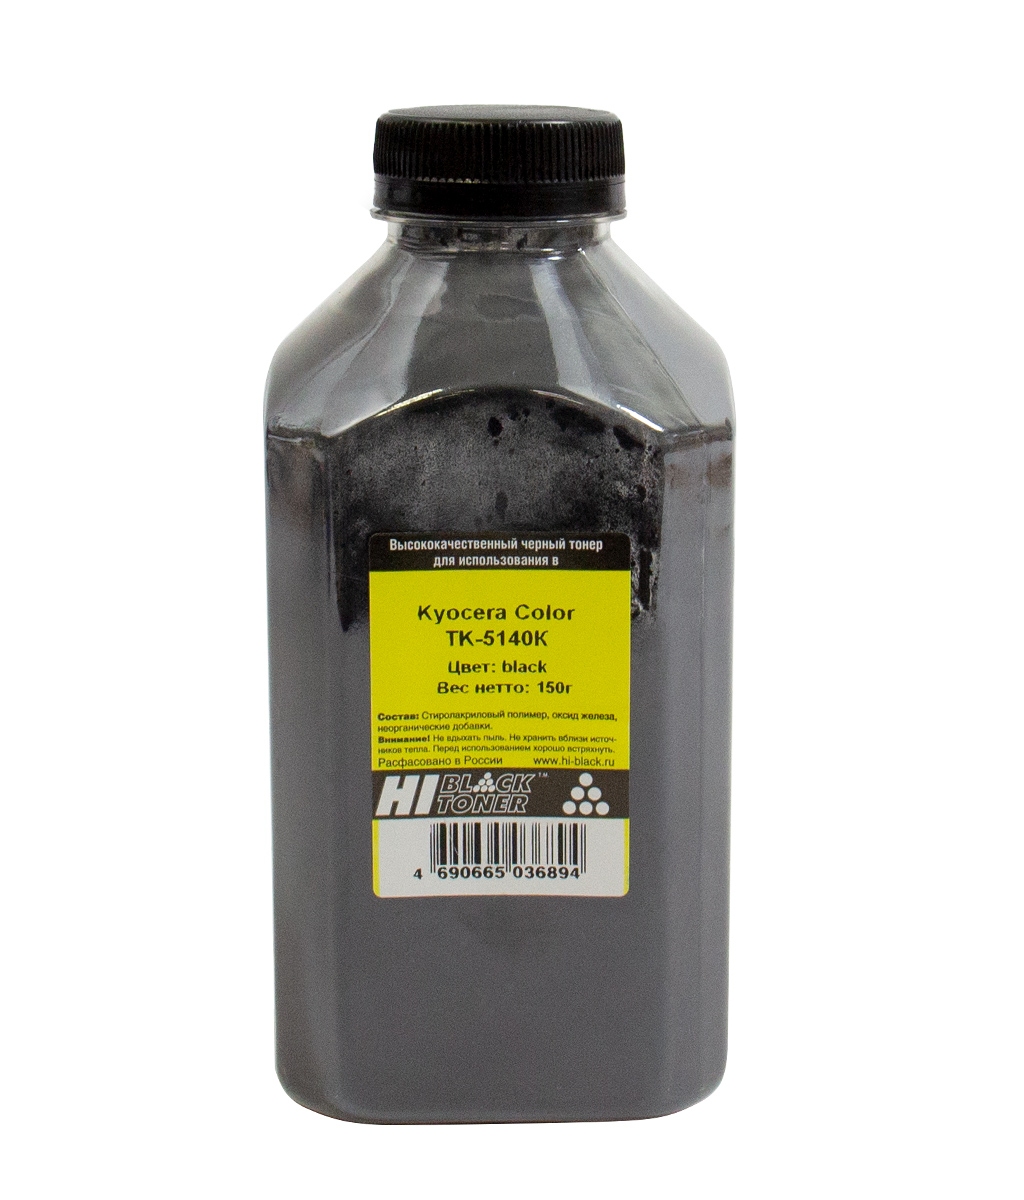 Тонер Hi-Black для Kyocera Color TK-5140K, Bk, 150 г, банка